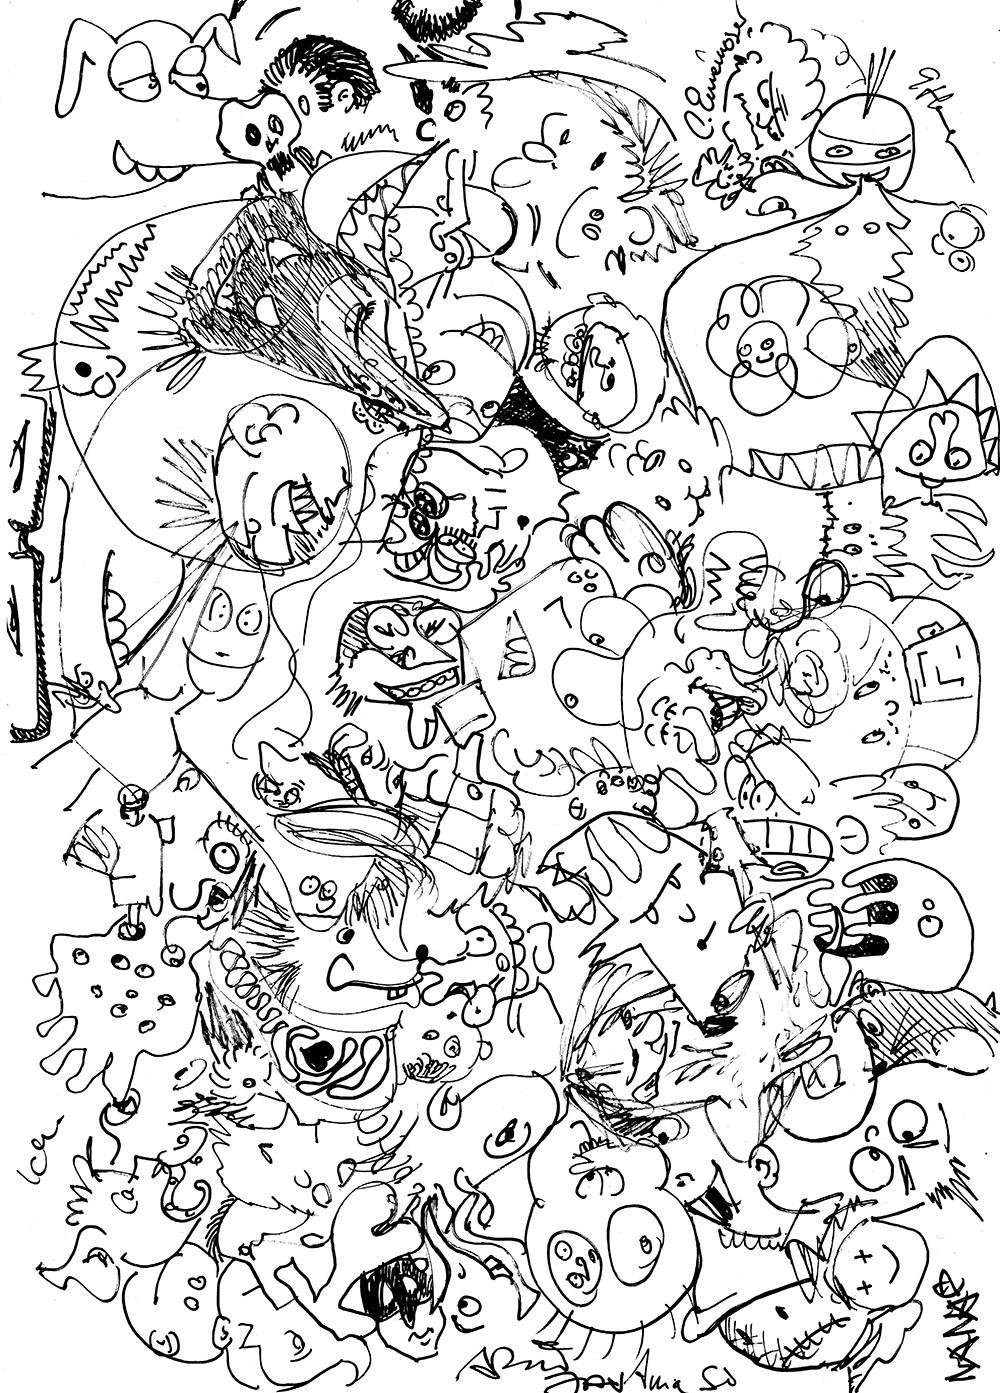 ComicJam 2015-06-10 1000px D